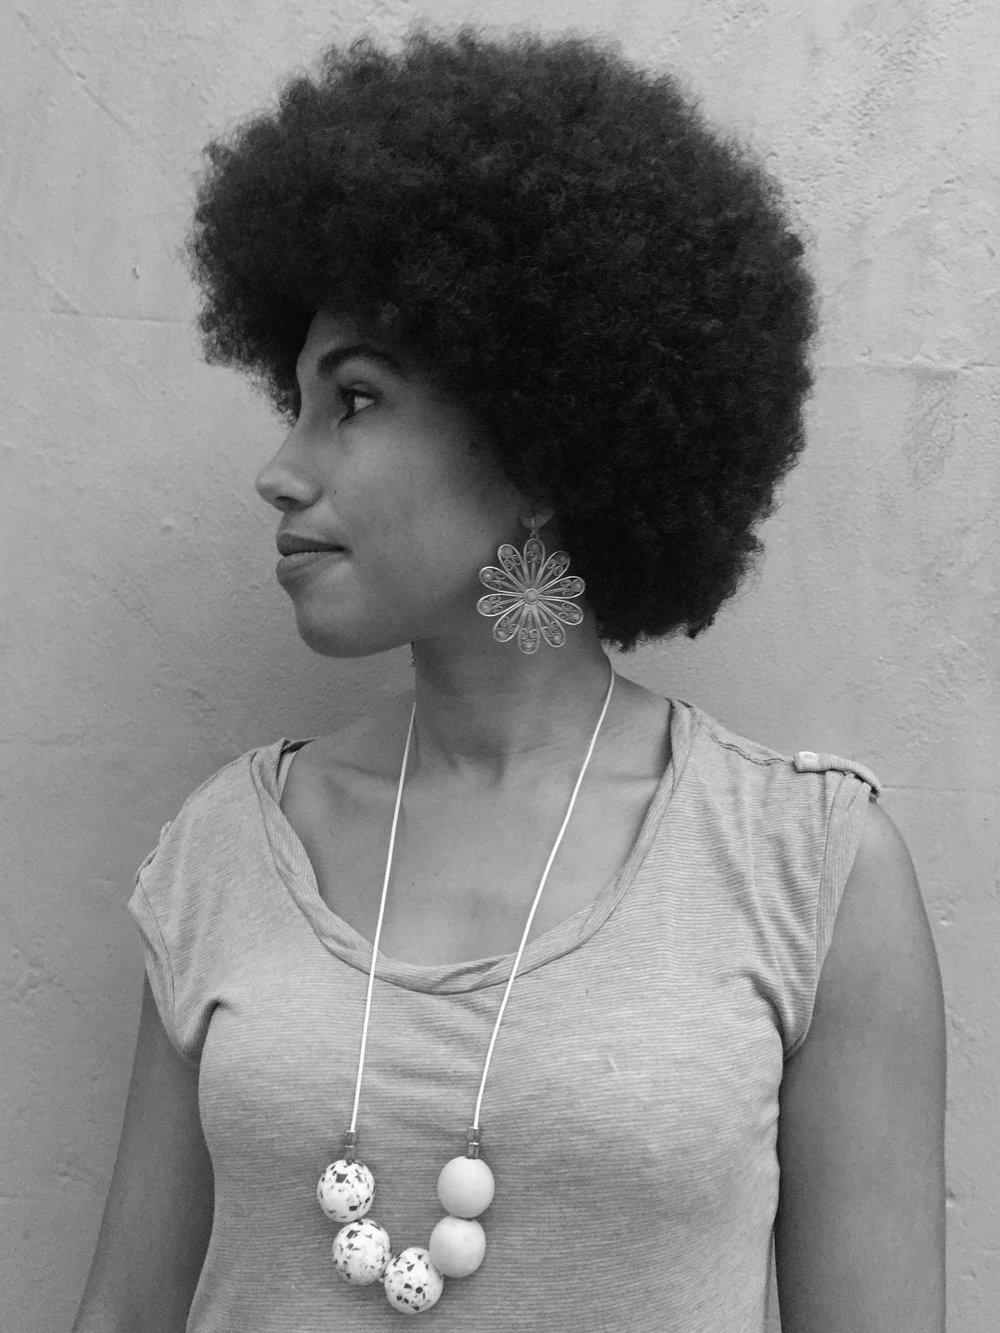 Afro re-shape side-on